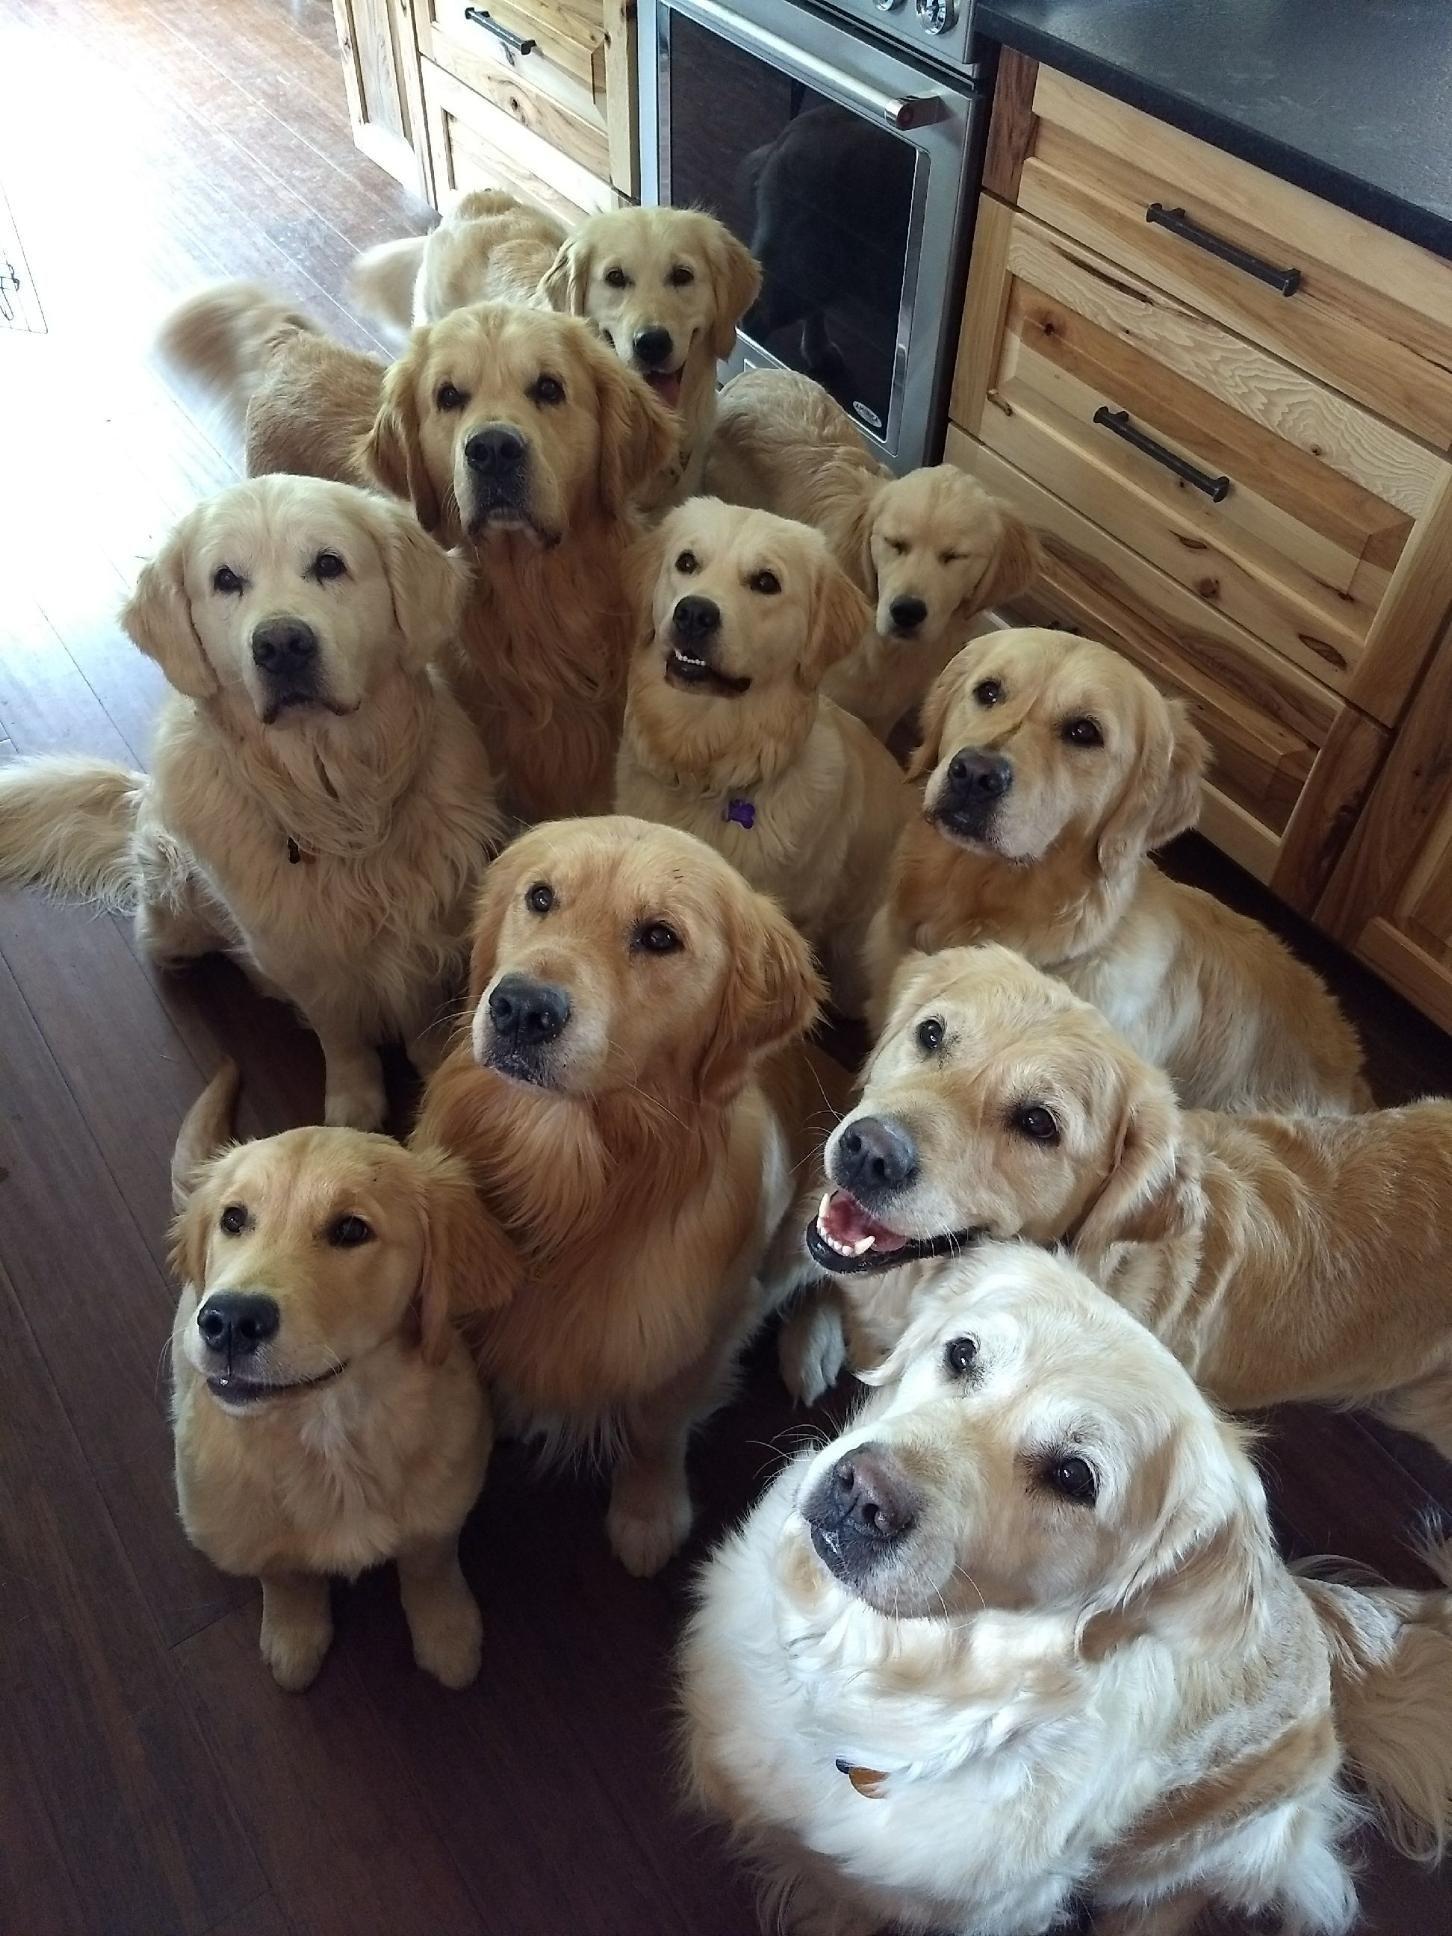 So Many Goldens Goldenretriever Dogs Golden Retriever Golden